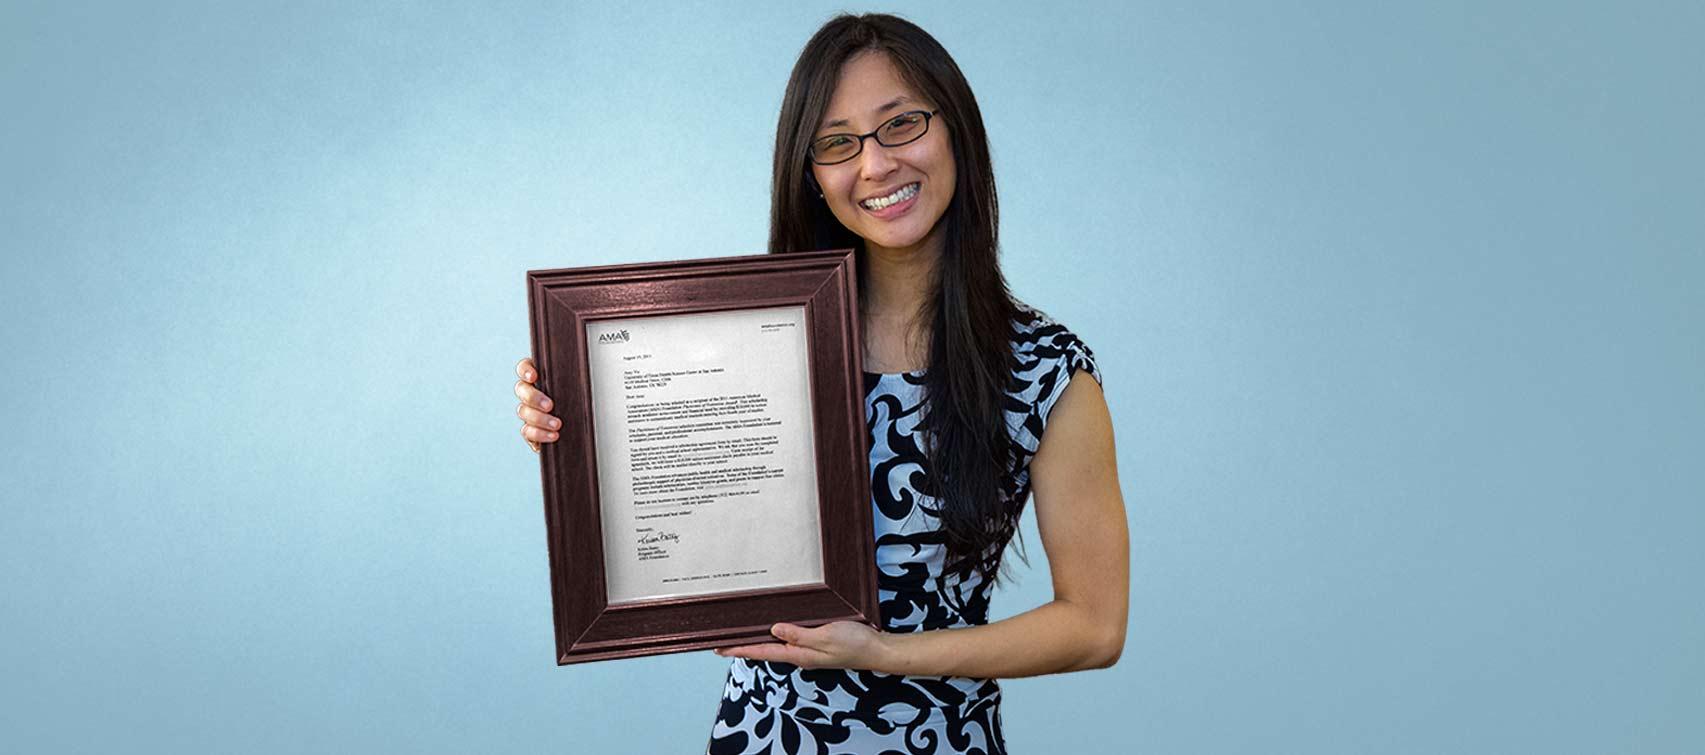 Amy Yu with American Medical Association Physician of Tomorrow award